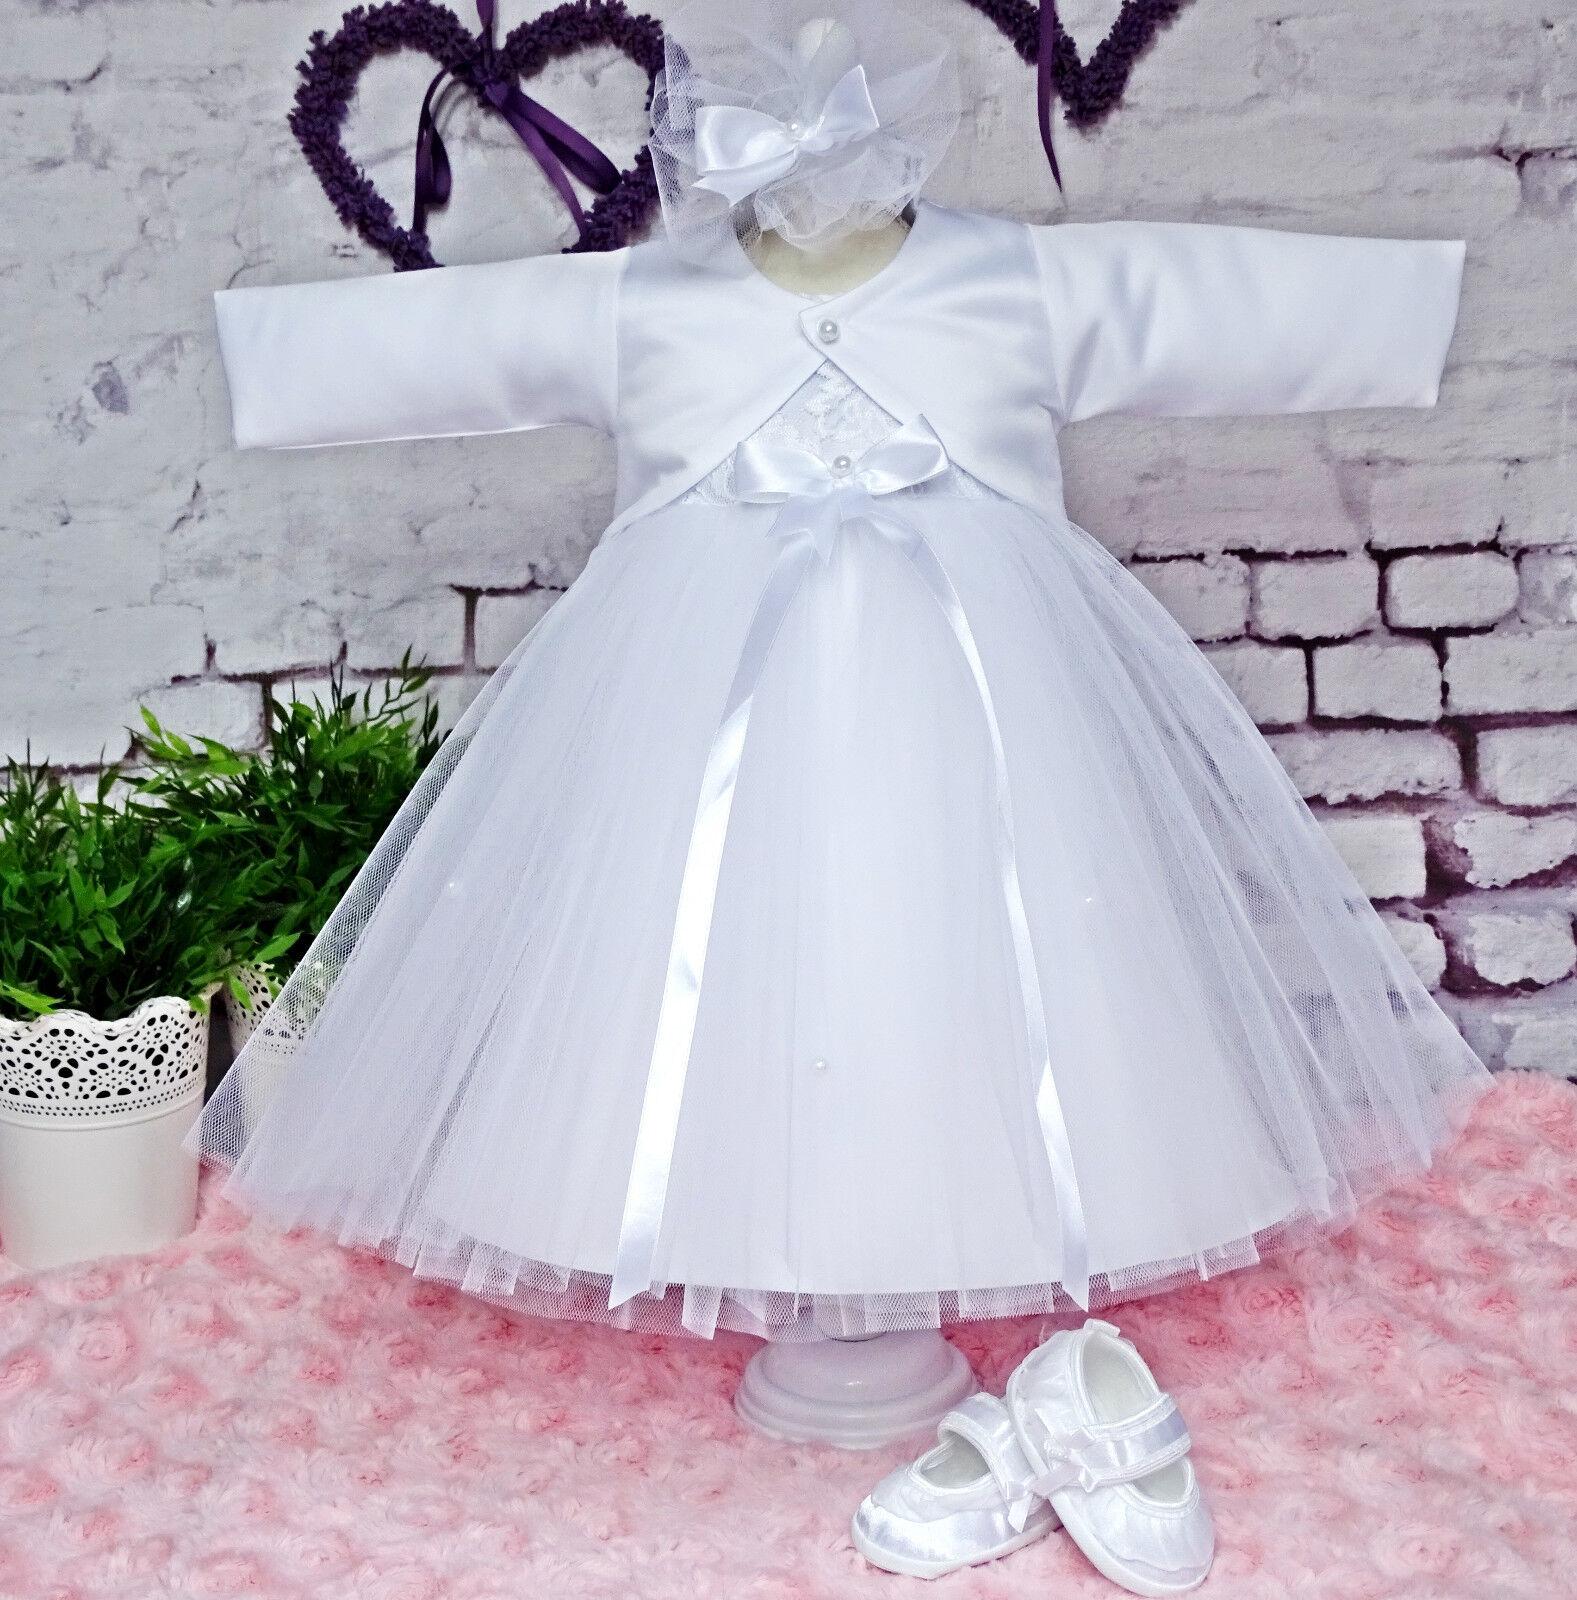 Taufkleid Set 4-teilig Kleid,Stirnband,Mantel,Mutze Gr 56-86 ❤️Neuheit ❤️